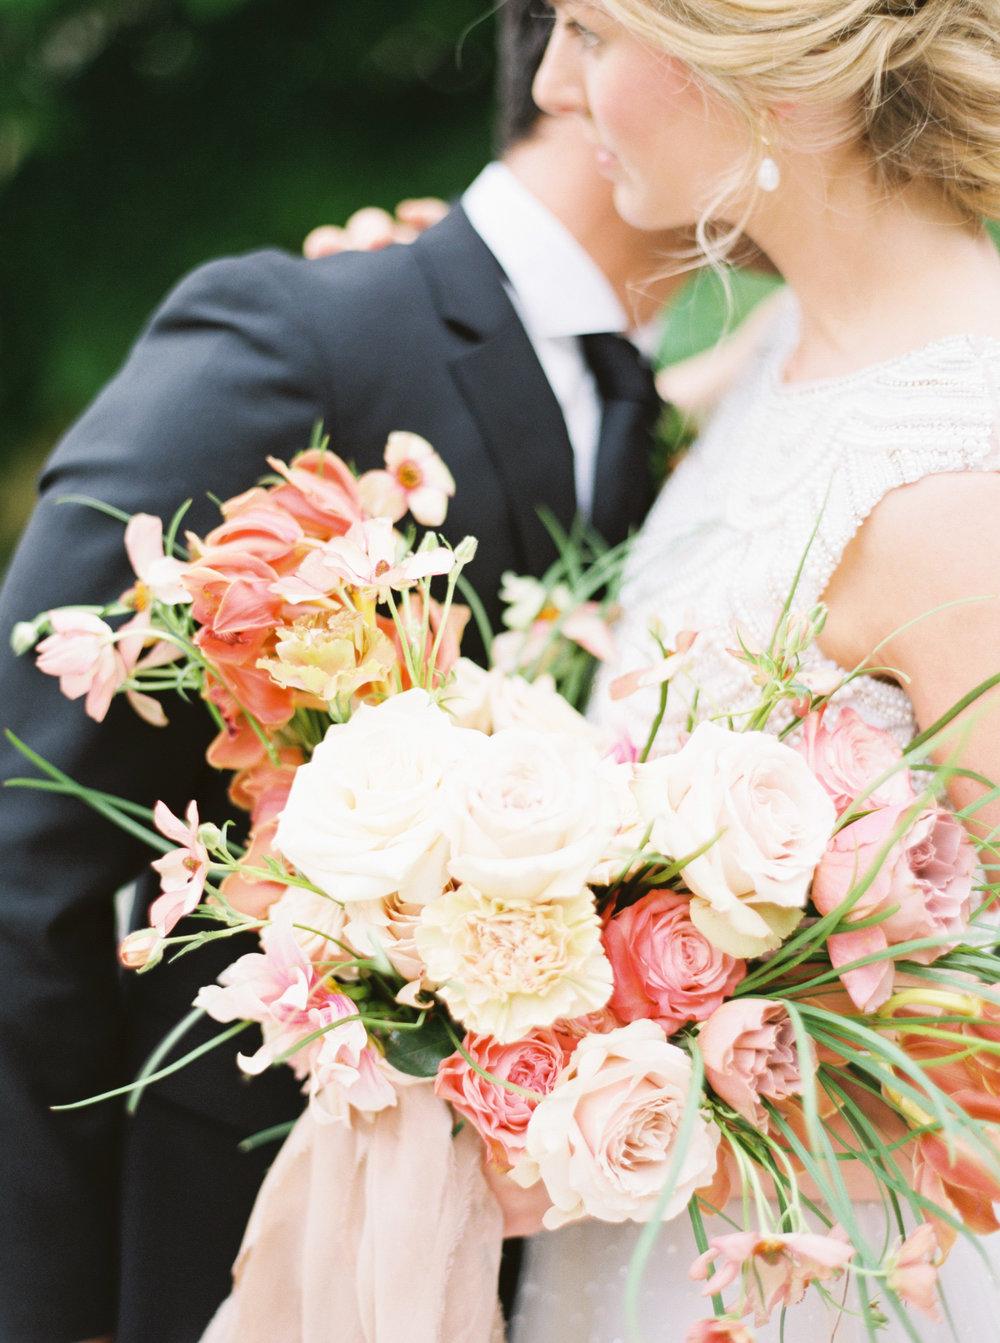 Timeless Southern Highland Wedding Elopement in Bowral NSW Fine Art Film Photographer Sheri McMahon-42.jpg